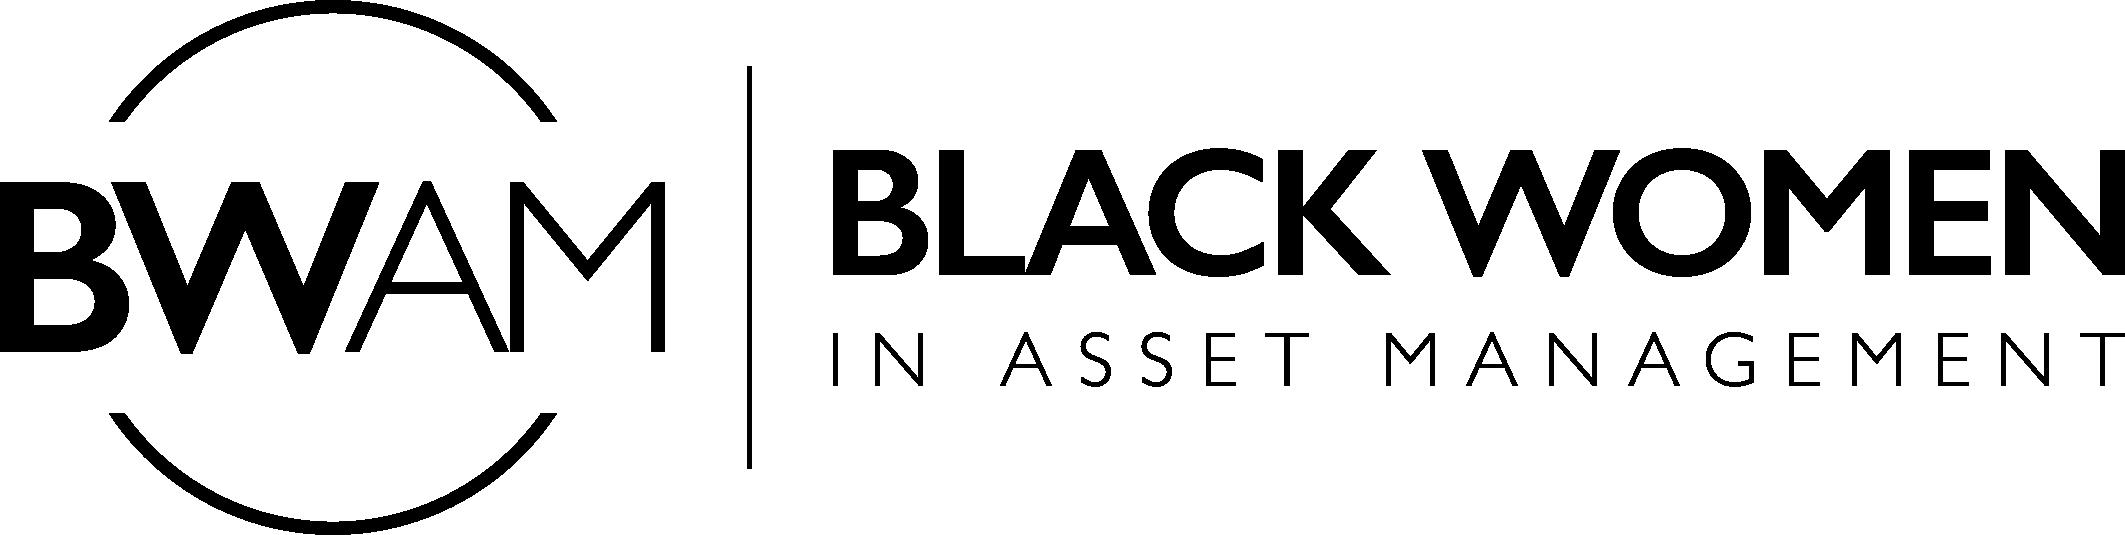 Black Women in Asset Management (BWAM)